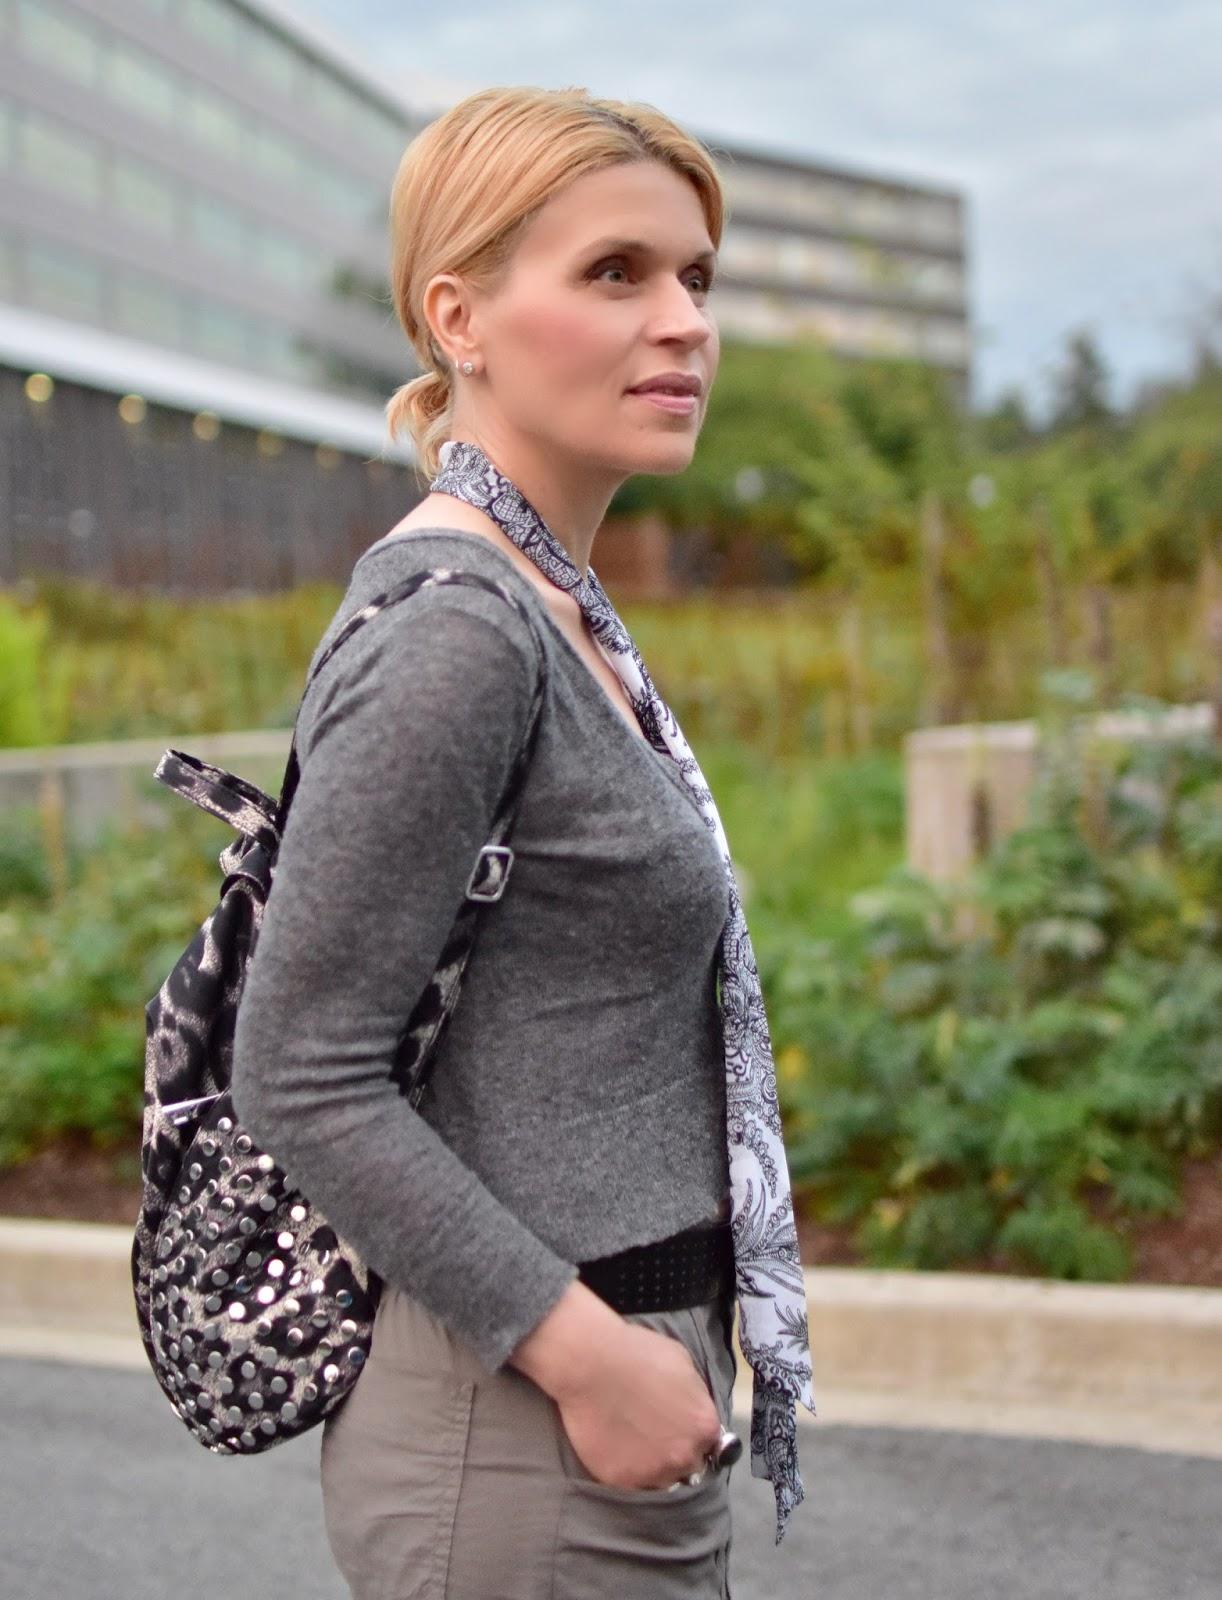 shrunken cardigan, leopard-patterned backpack, skinny paisley scarf